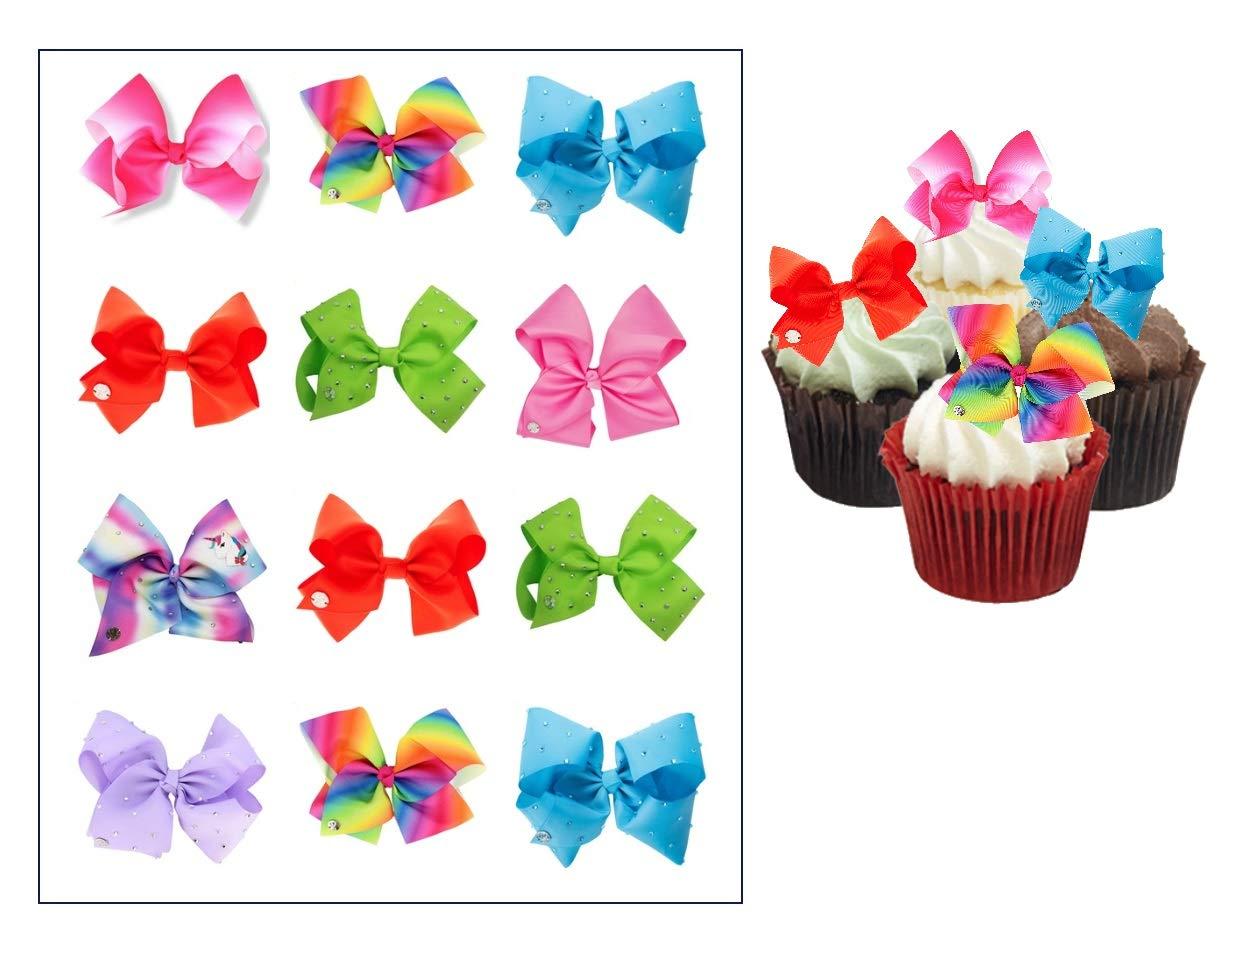 EDIBLE Jojo Siwa Bows ~ Cupcake Topper ~ Edible Frosting Image ~ Wafer Paper ~ Rice Paper Jojo Siwa cupcake toppers ~ Party Supplies by Pink Owl Edible Art